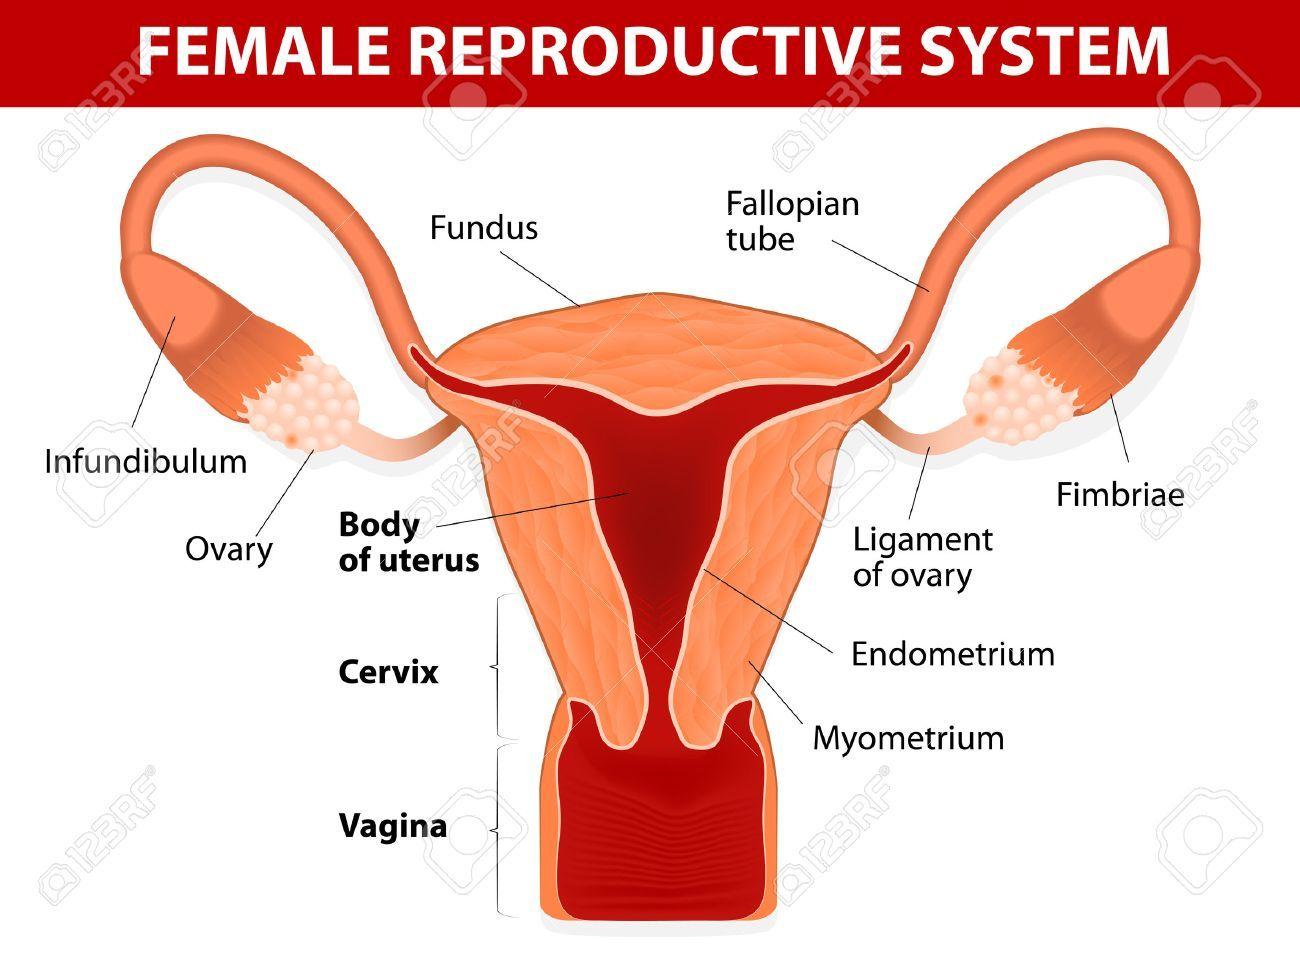 Human Female Reproductive System Diagram Koibana Info Reproductive System Female Reproductive System Fibroids Symptoms